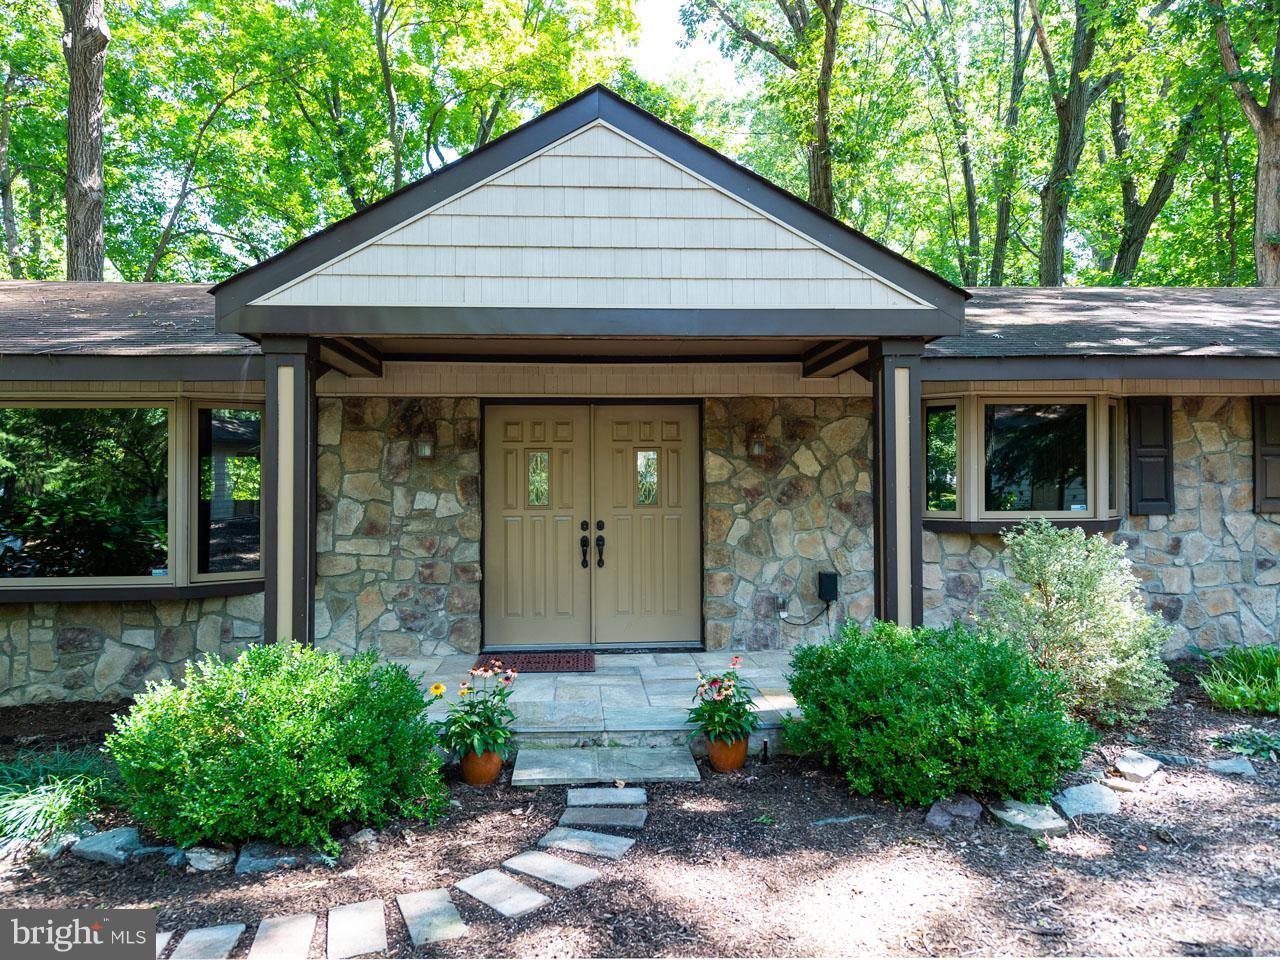 1002303700-300502419414-2021-07-22-03-27-22  |   | Alexandria Delaware Real Estate For Sale | MLS# 1002303700  - Best of Northern Virginia